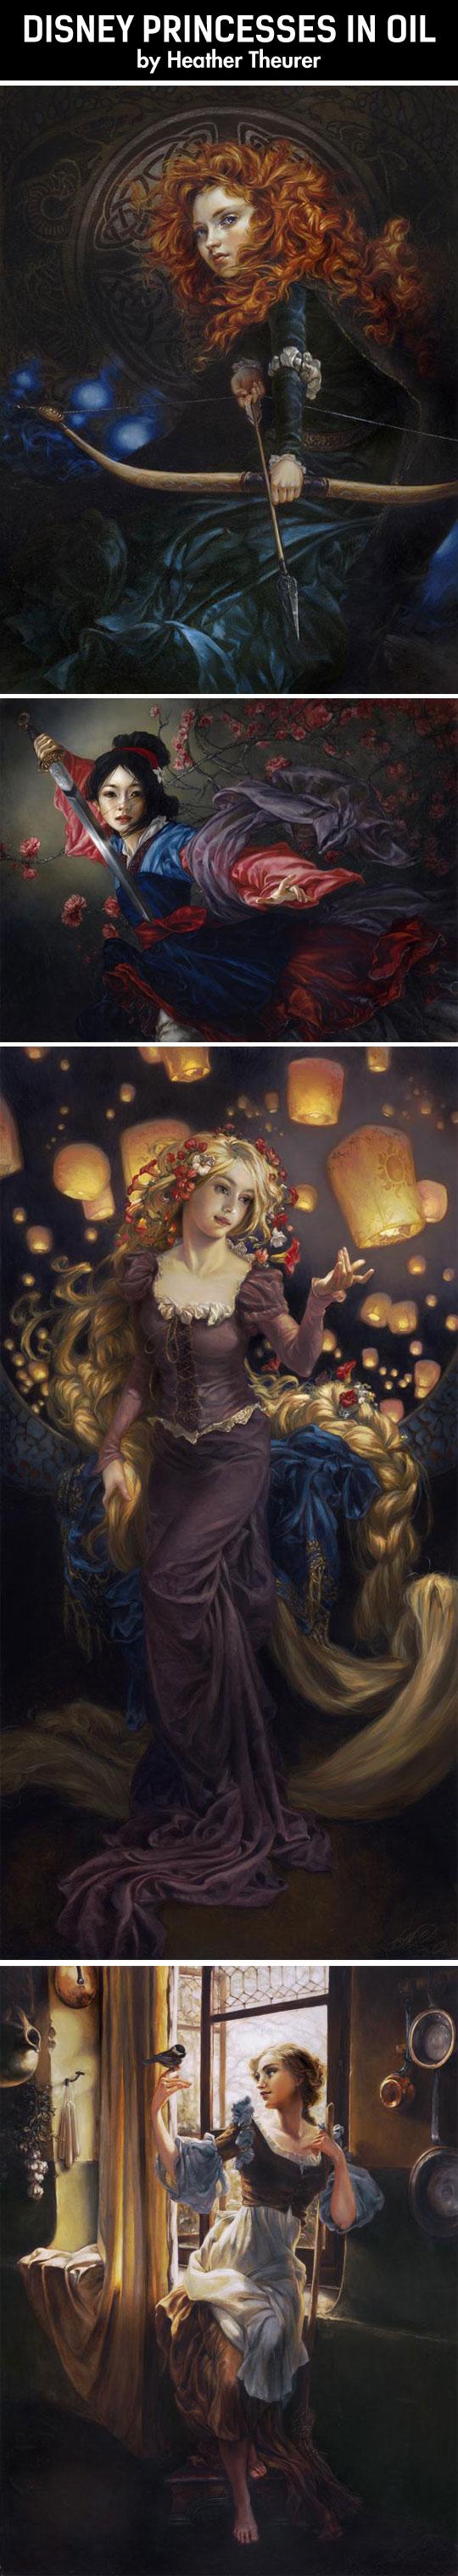 cool-Disney-princesses-oil-paintings